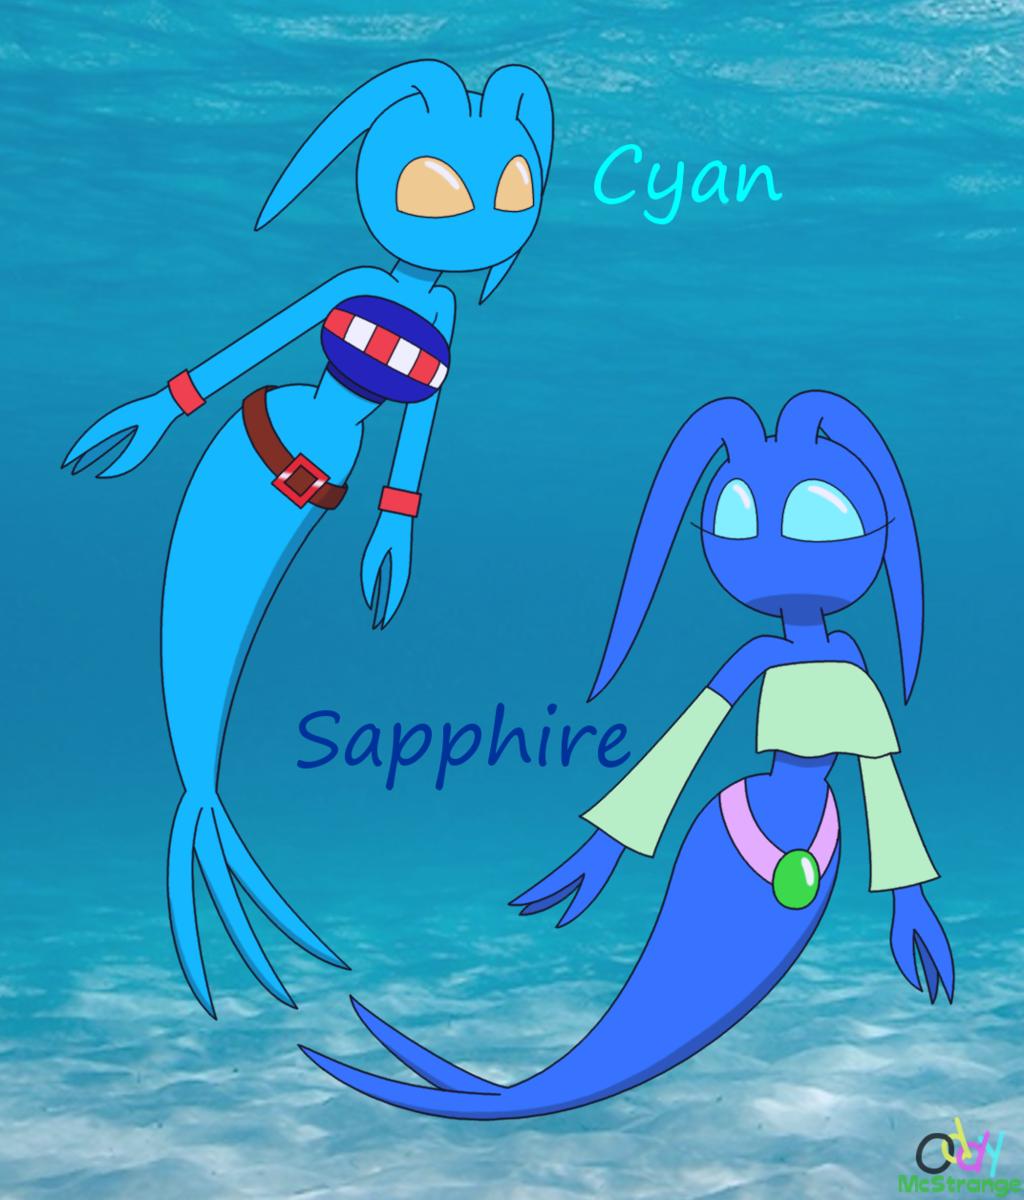 Cyan and Sapphire